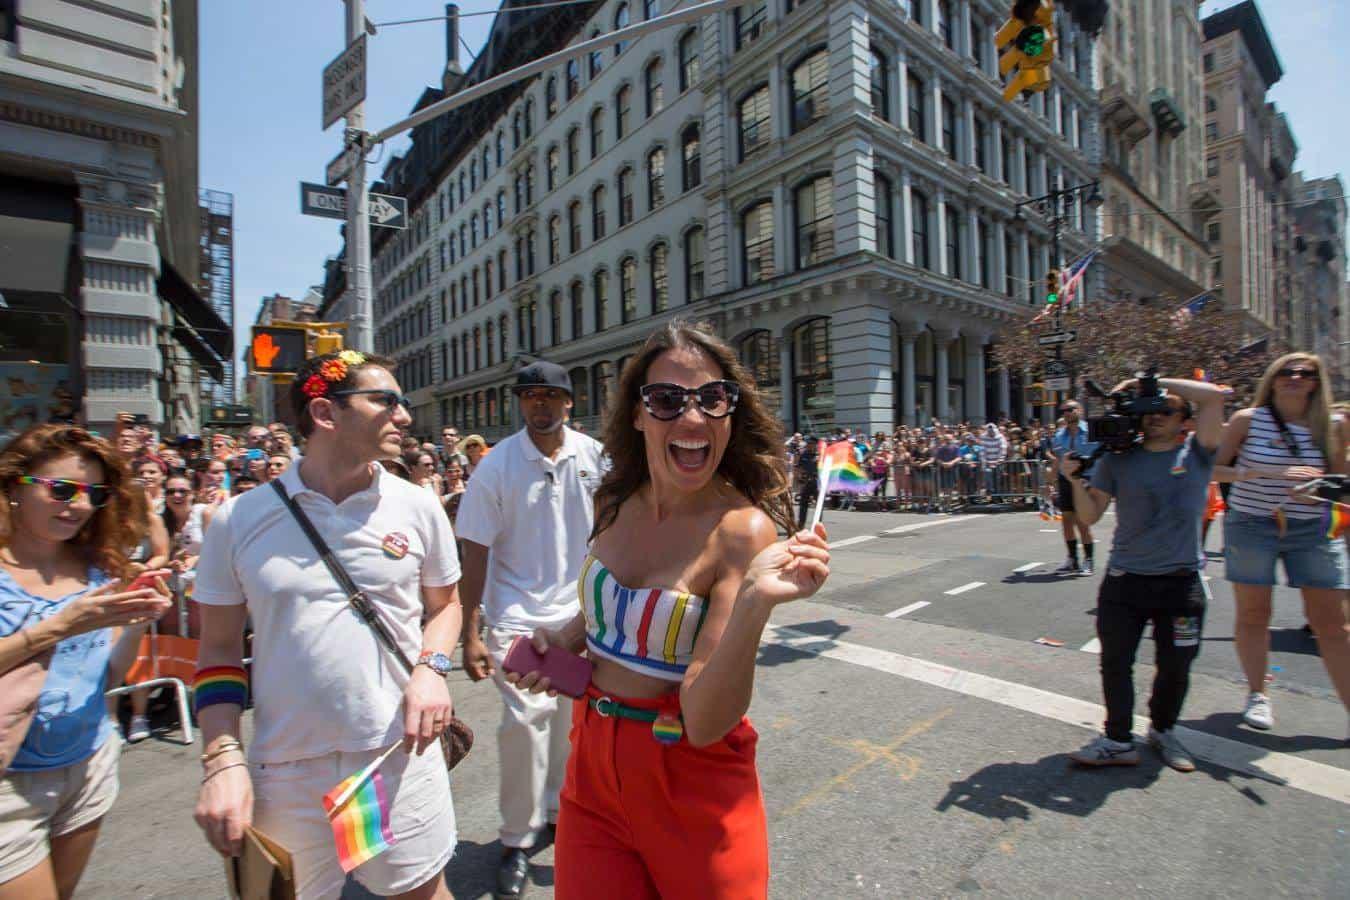 Oitnb New York5, Hay una lesbiana en mi sopa